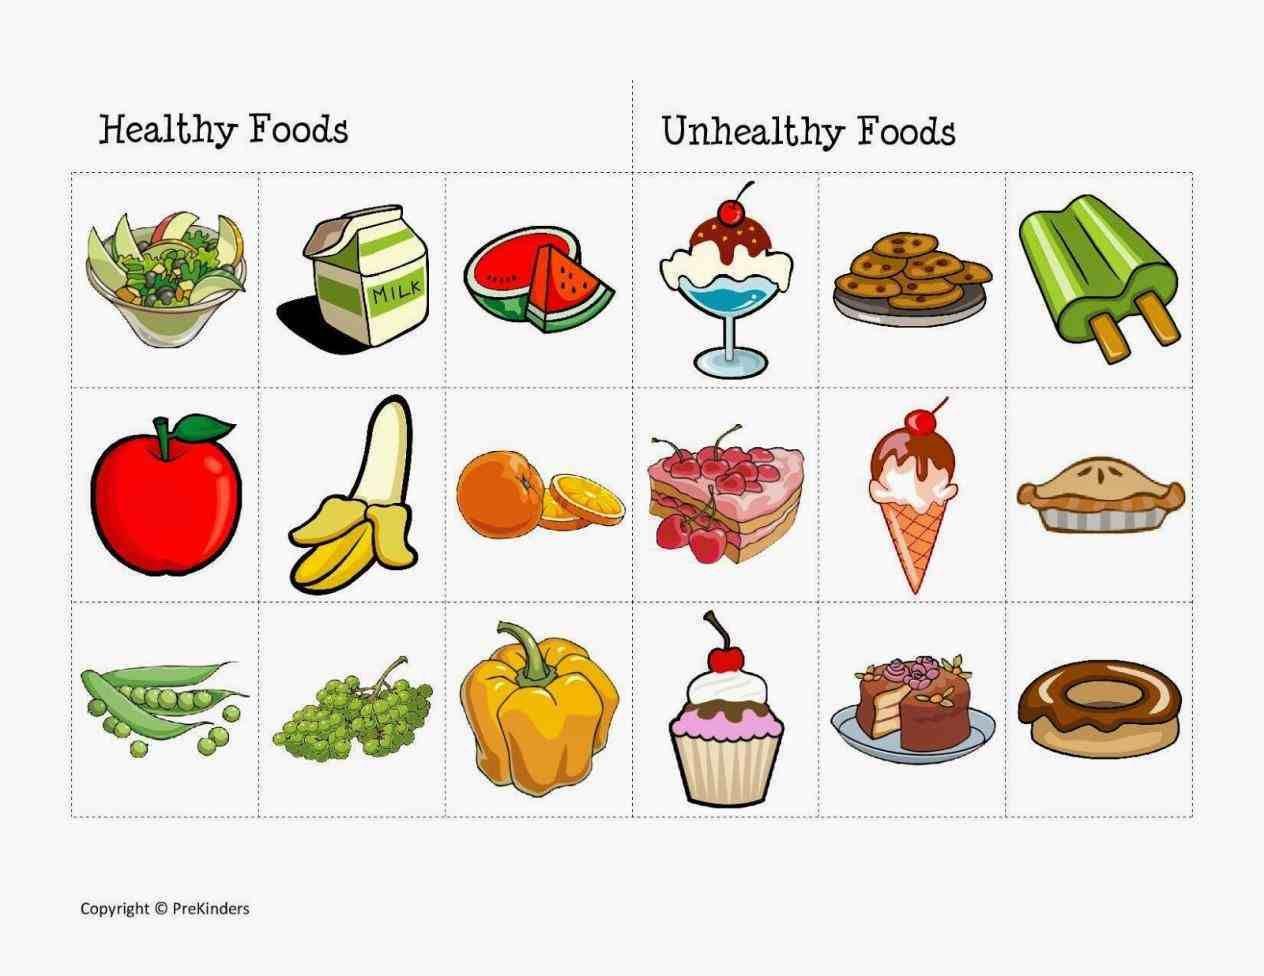 S Unhealthy Food Vs Healthy Food Clipart Worksheet